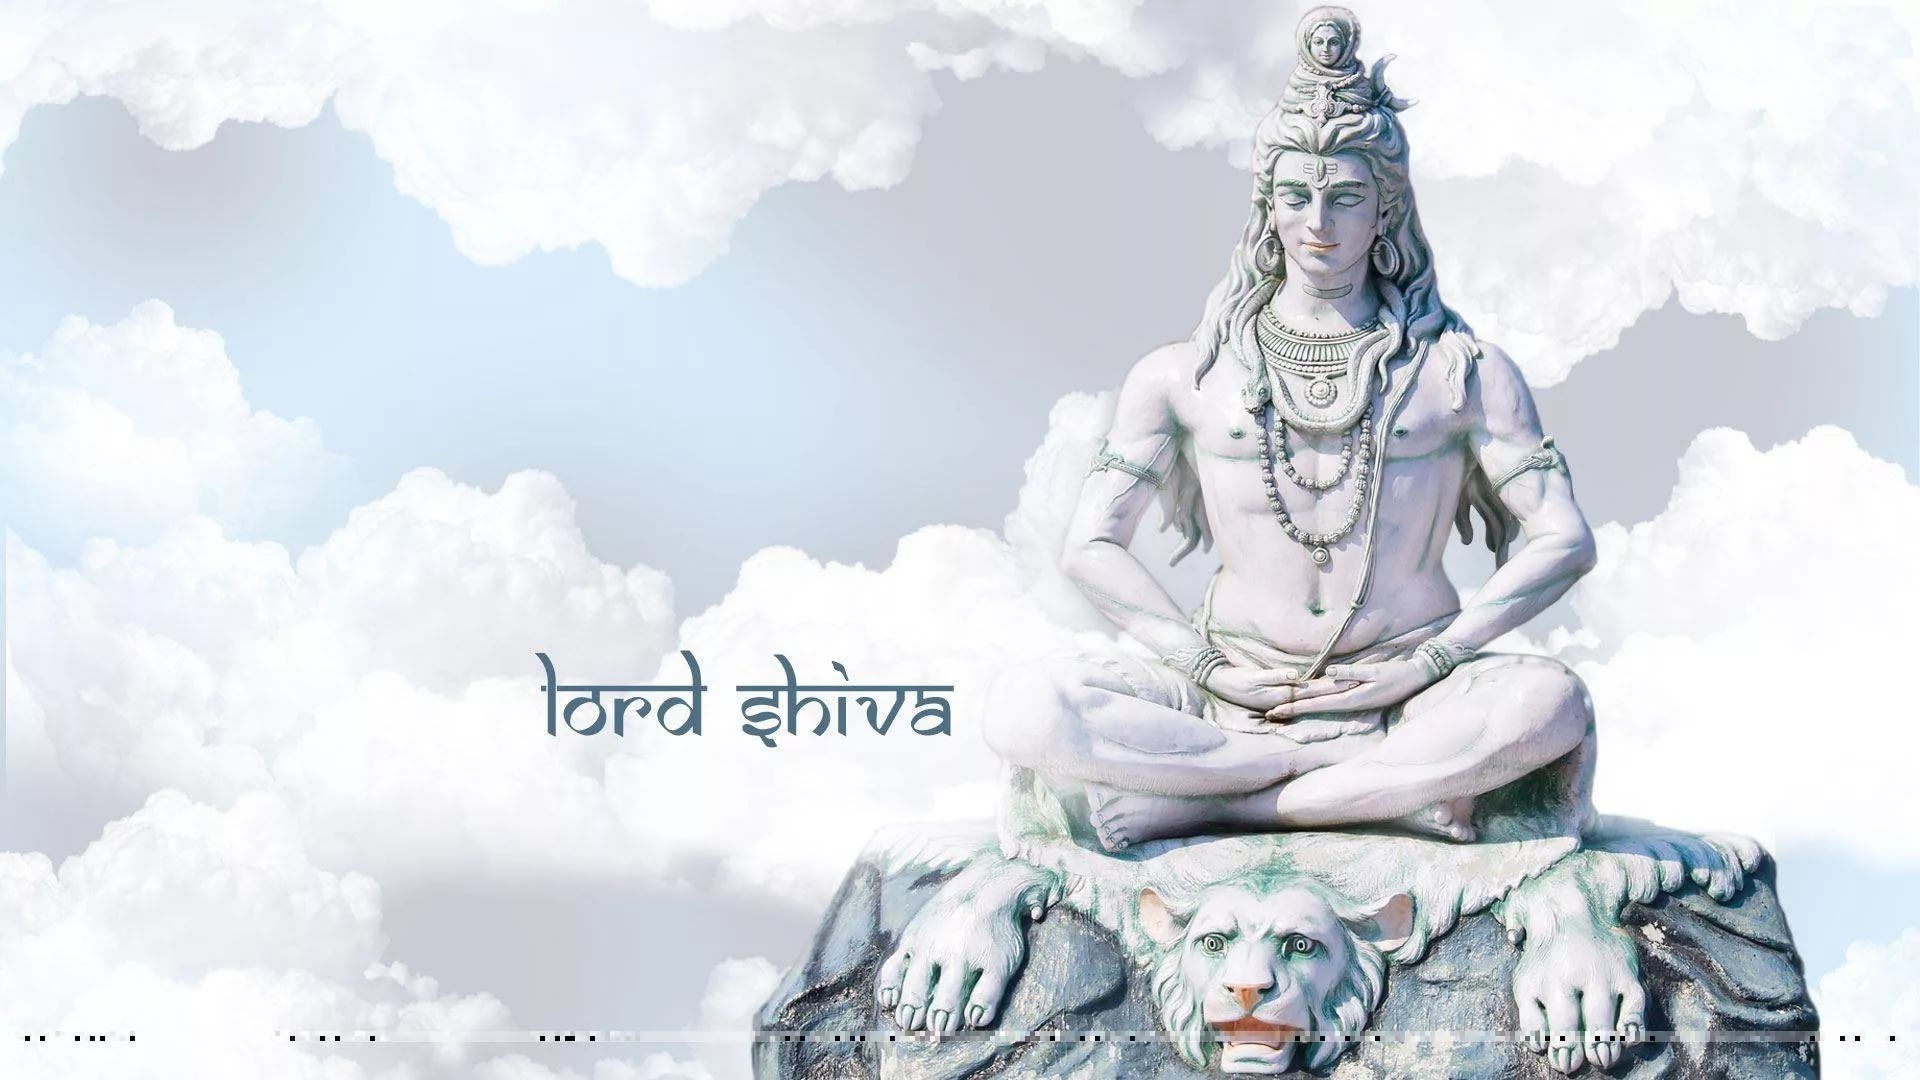 Lord Shiva Tandav Hd hd desktop wallpaper